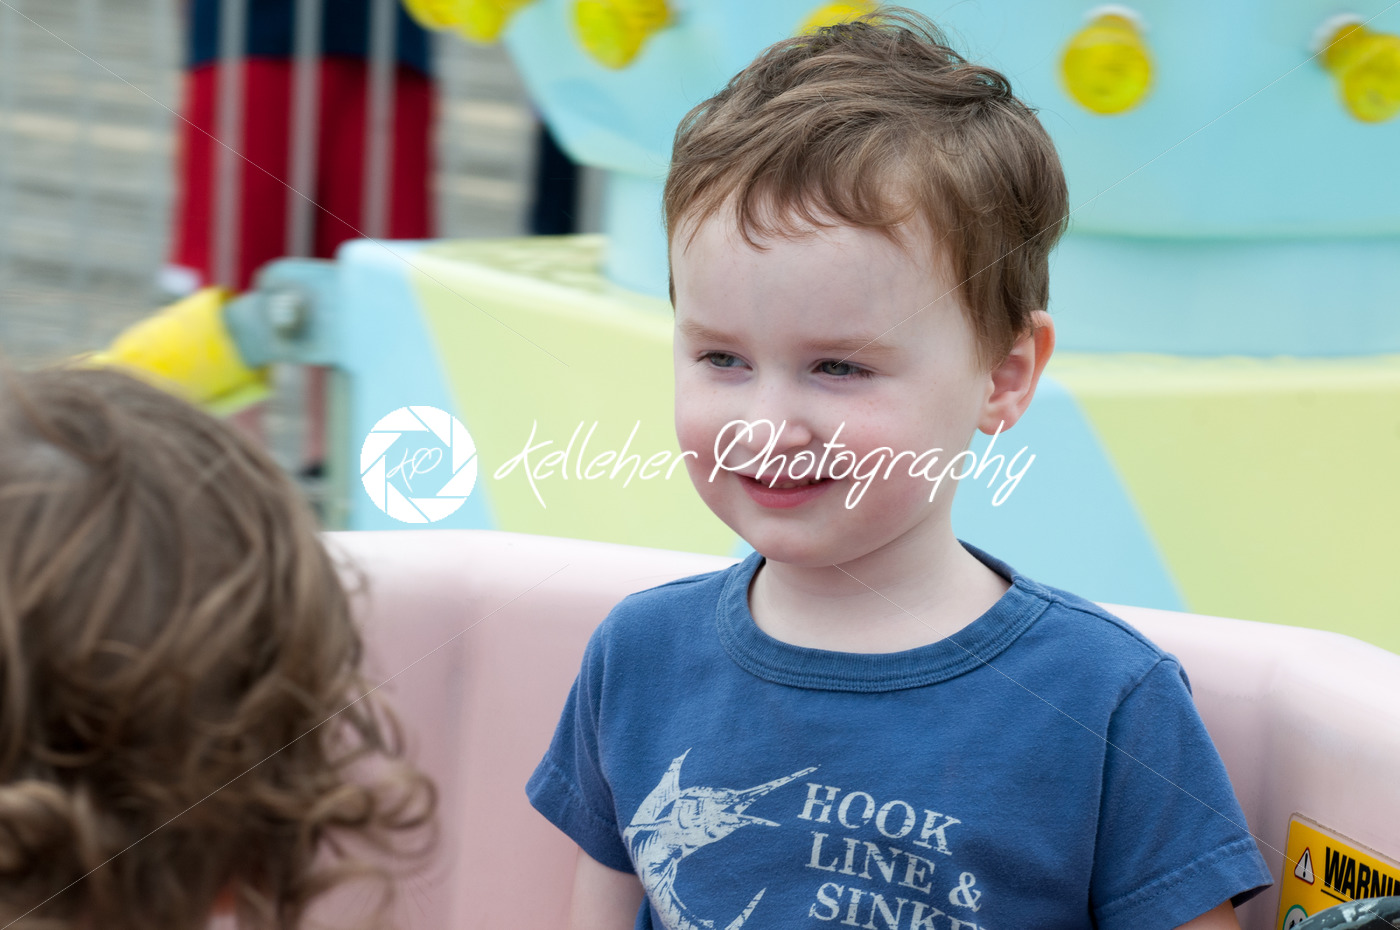 Young toddler boy having fun on boardwalk amusement ride - Kelleher Photography Store